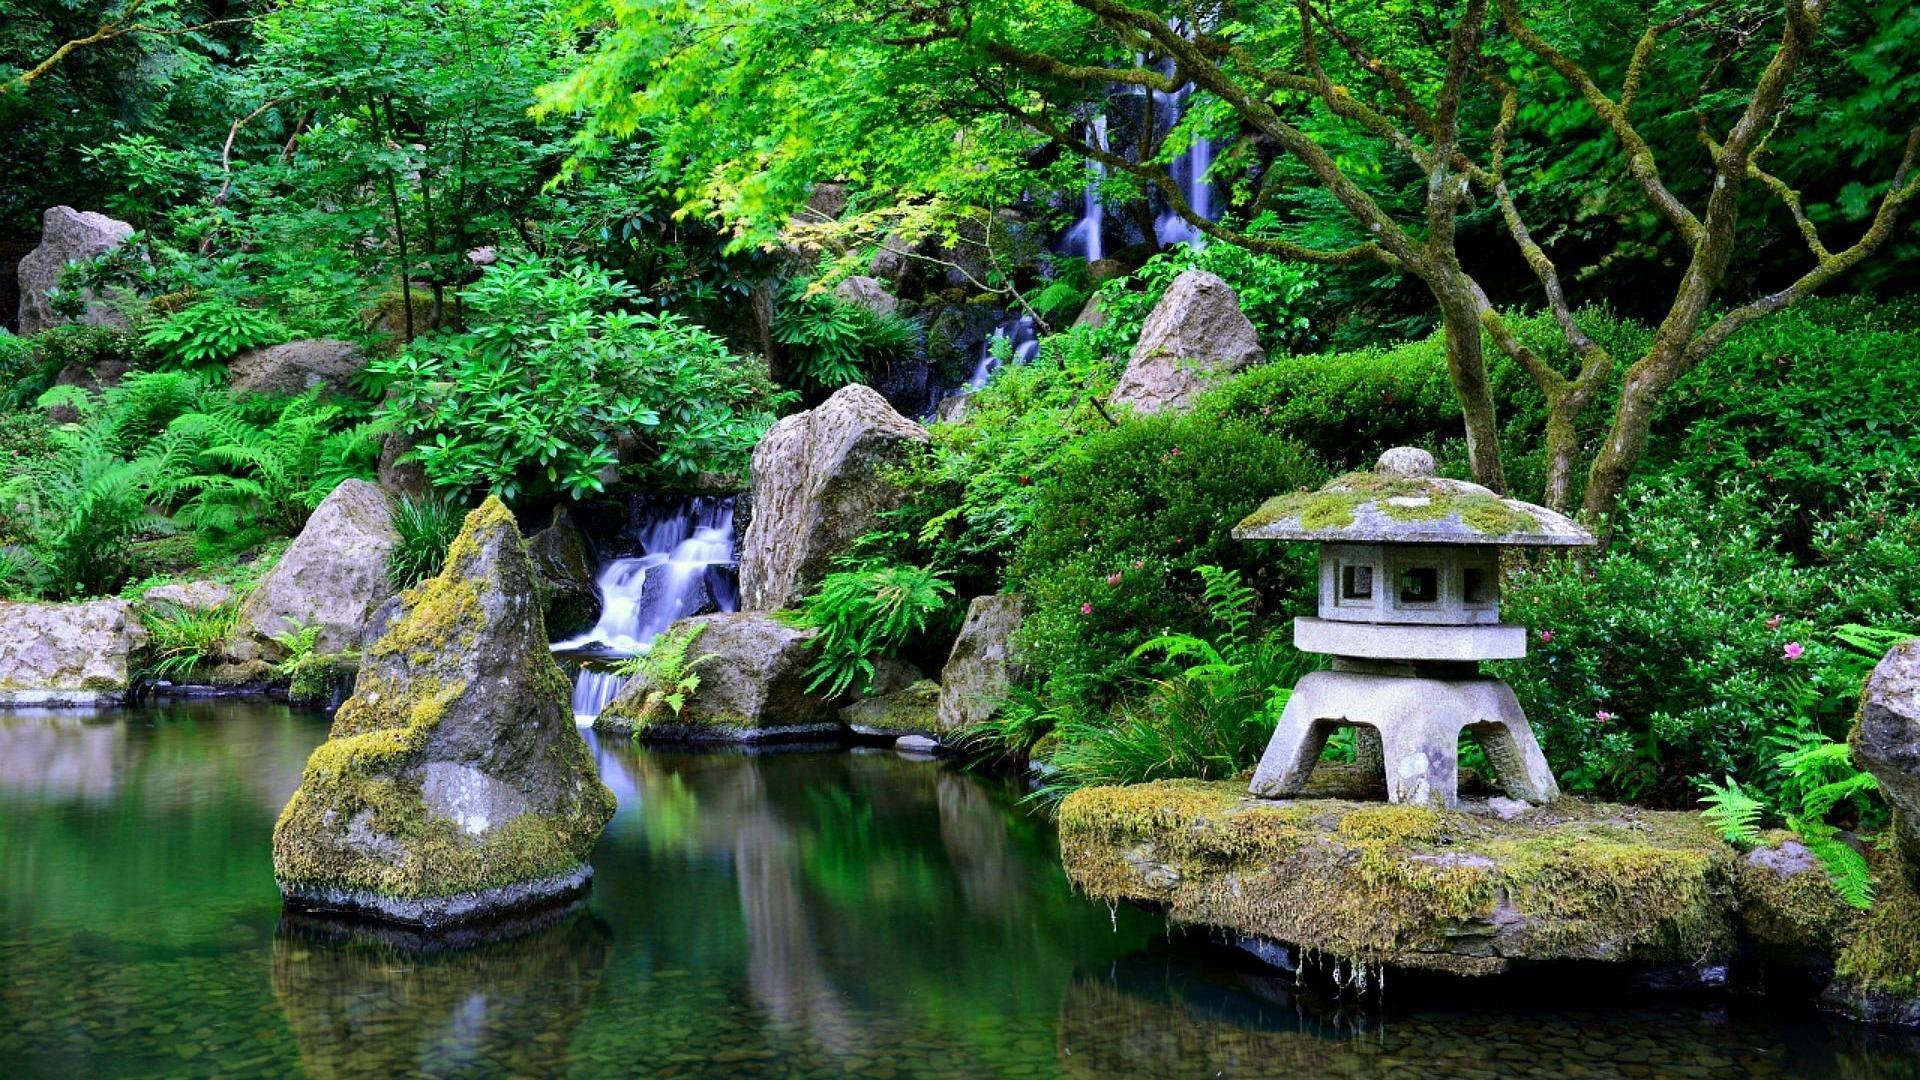 photos japanese garden - media file | pixelstalk